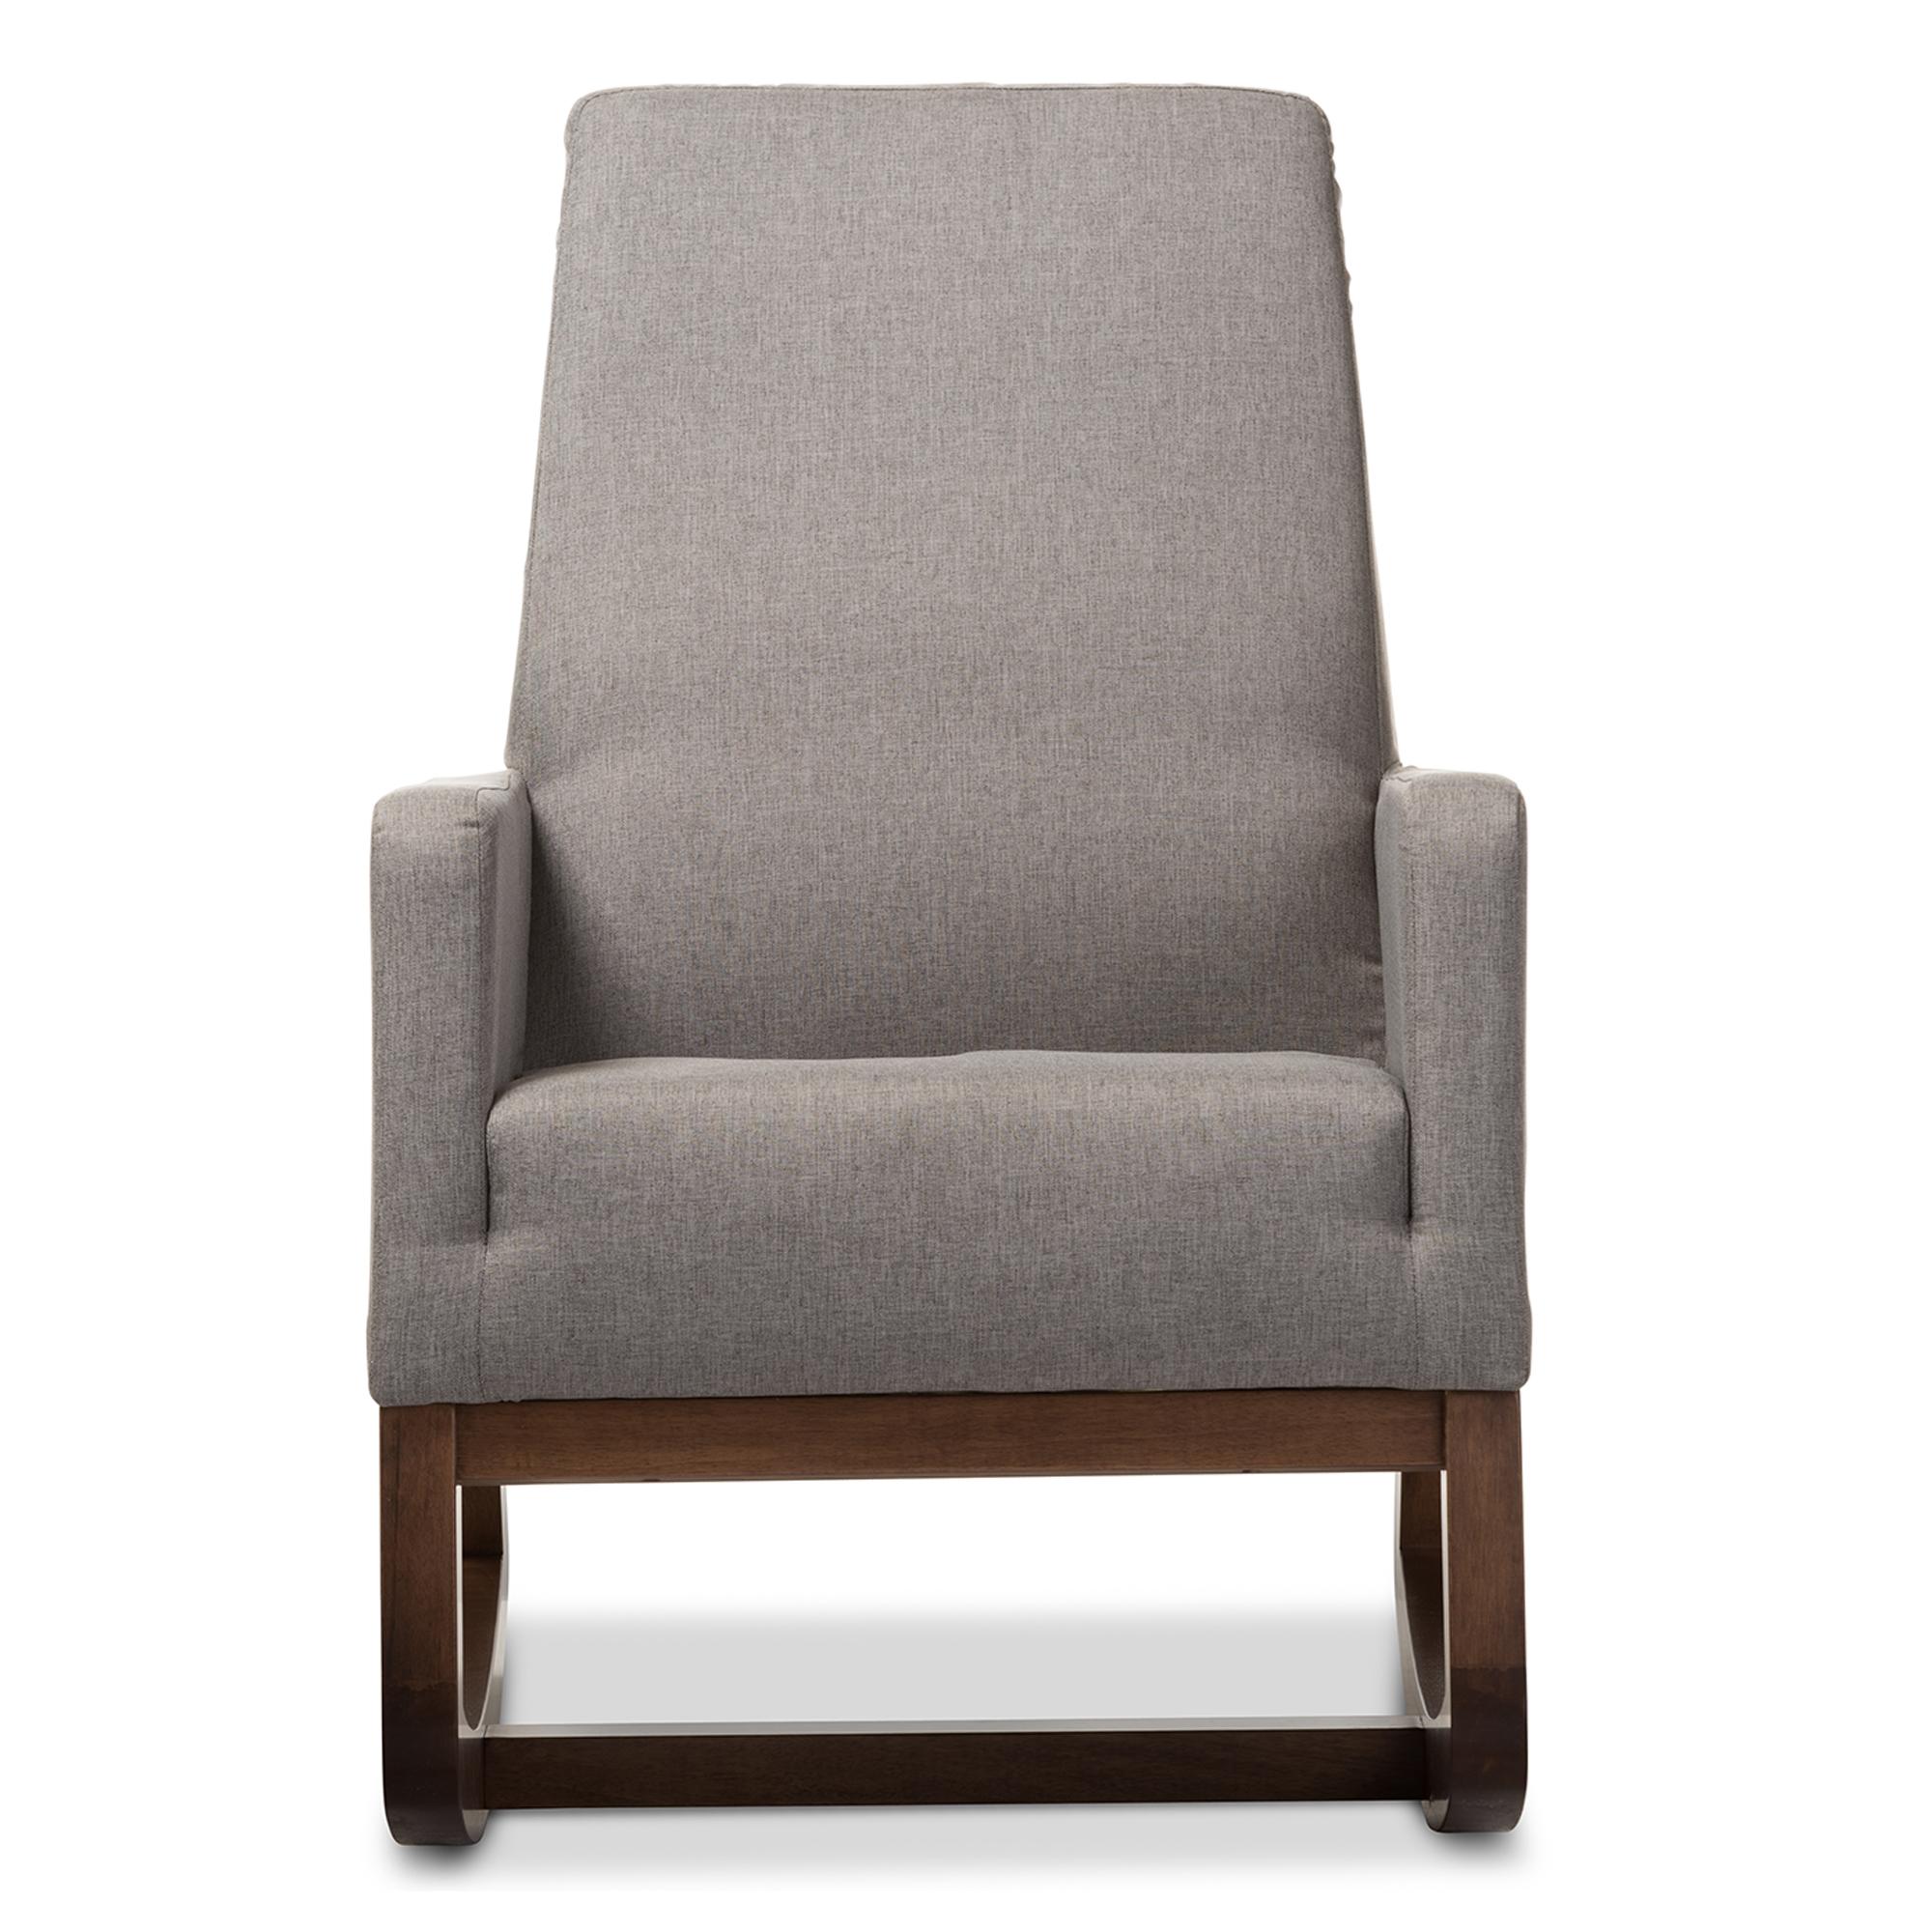 Baxton Studio | Wholesale Rocking Chairs | Wholesale Living Room Furniture  | Wholesale Furniture Part 53